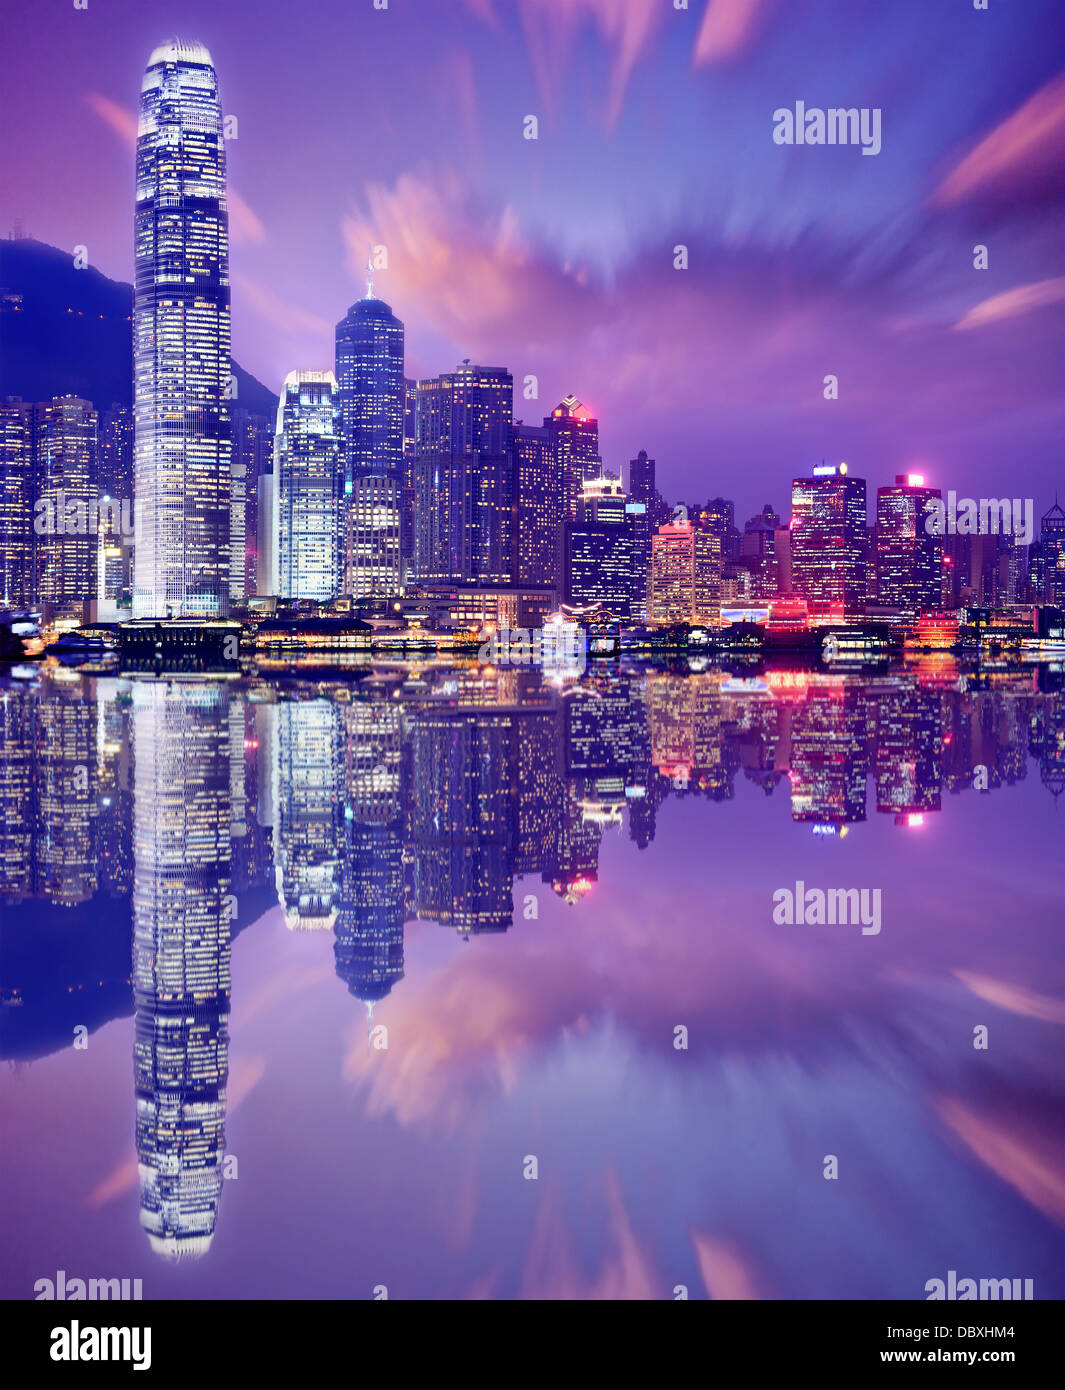 Hong Kong, China skyline from Victoria Harbor. - Stock Image